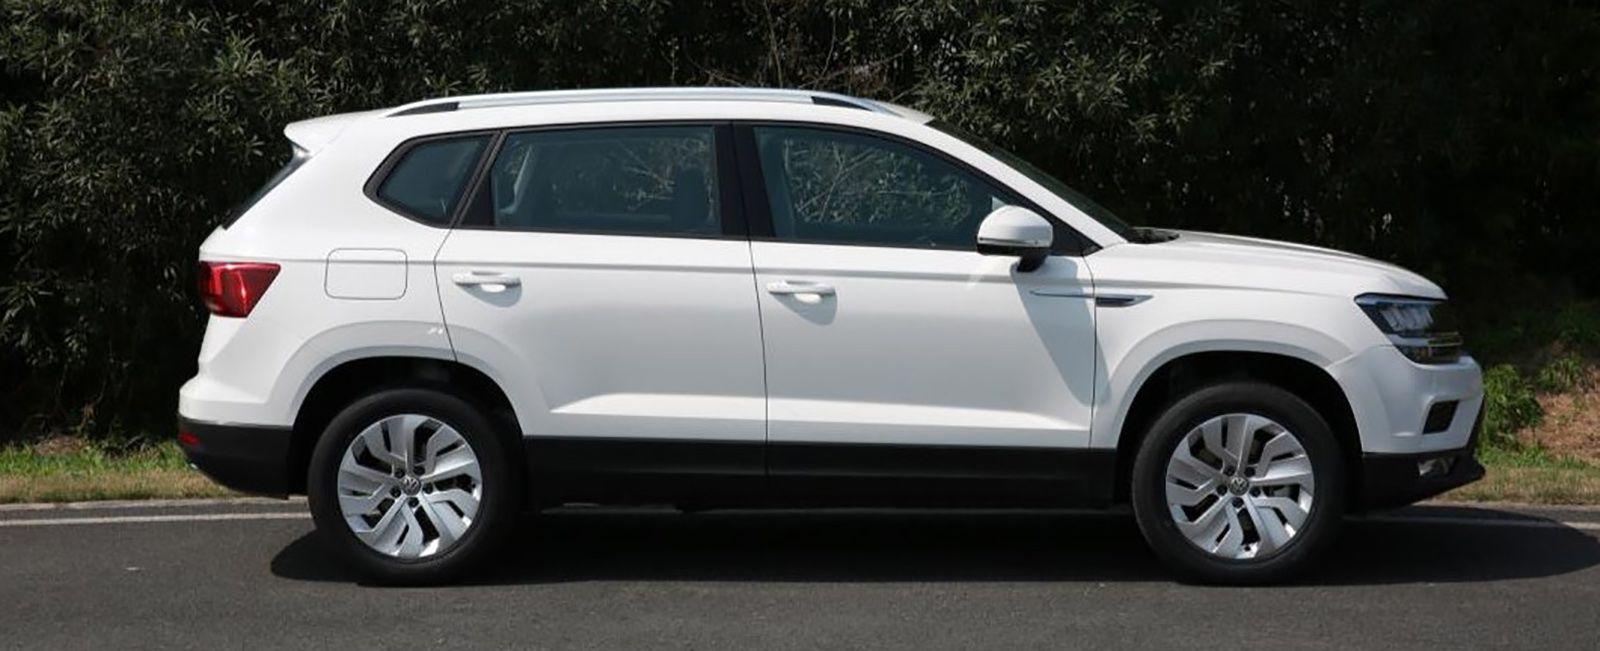 Volkswagen Tarek Tharu China fotos vazadas